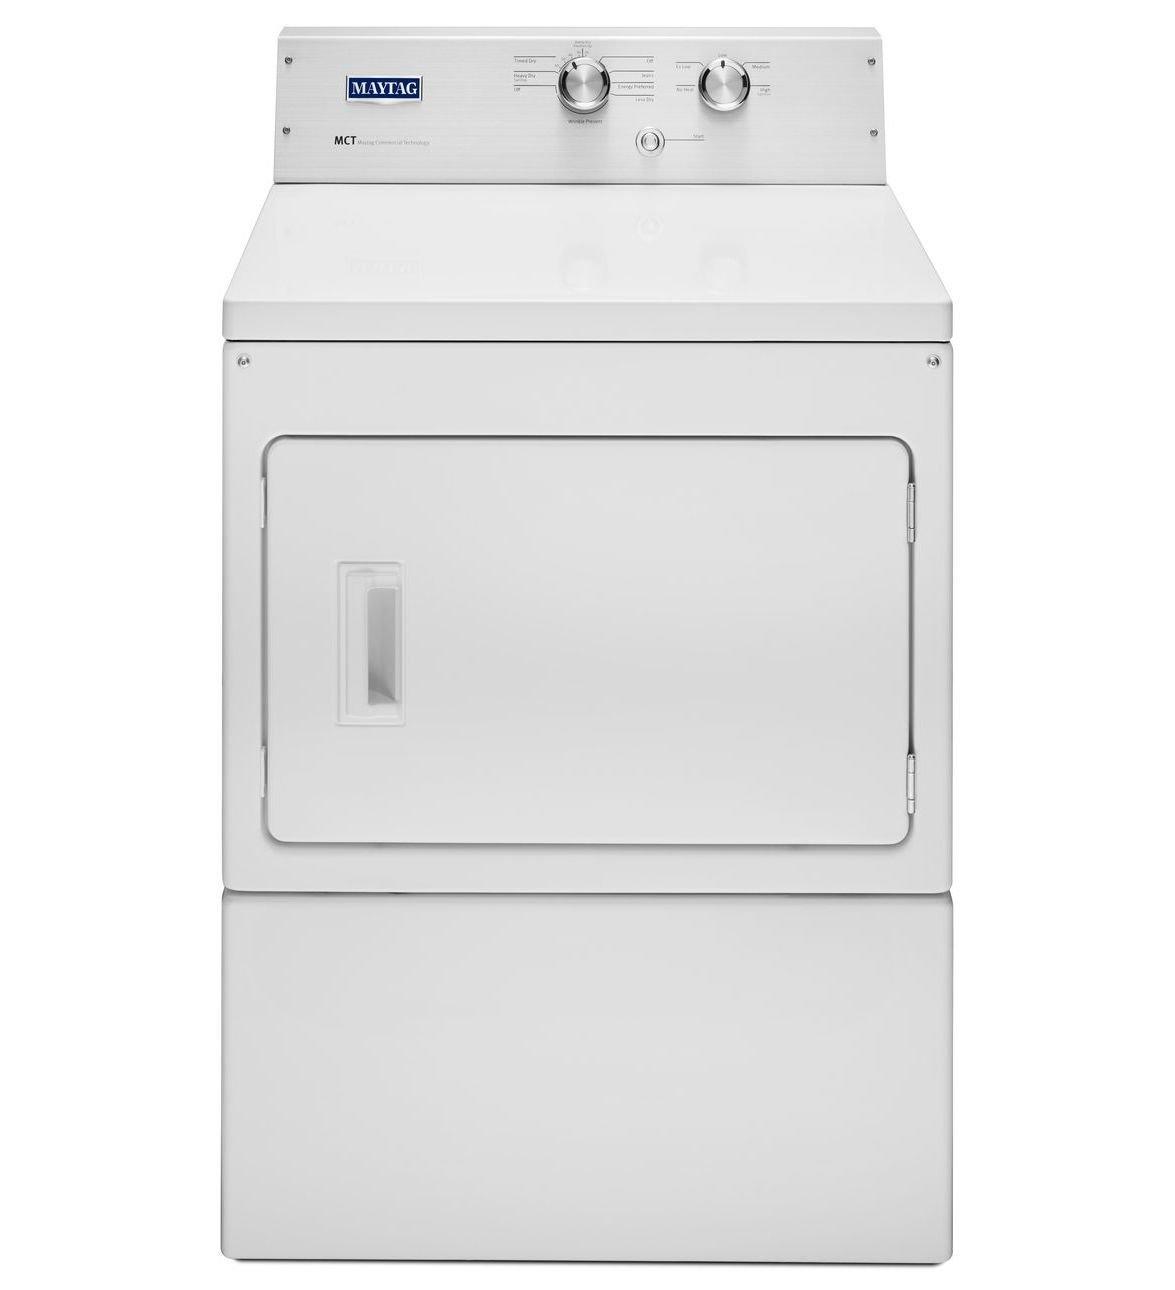 Maytag® 7.0 Cu. Ft. Large Capacity Dryer with IntelliDry® Sensor Technology MGDP475EW -  White